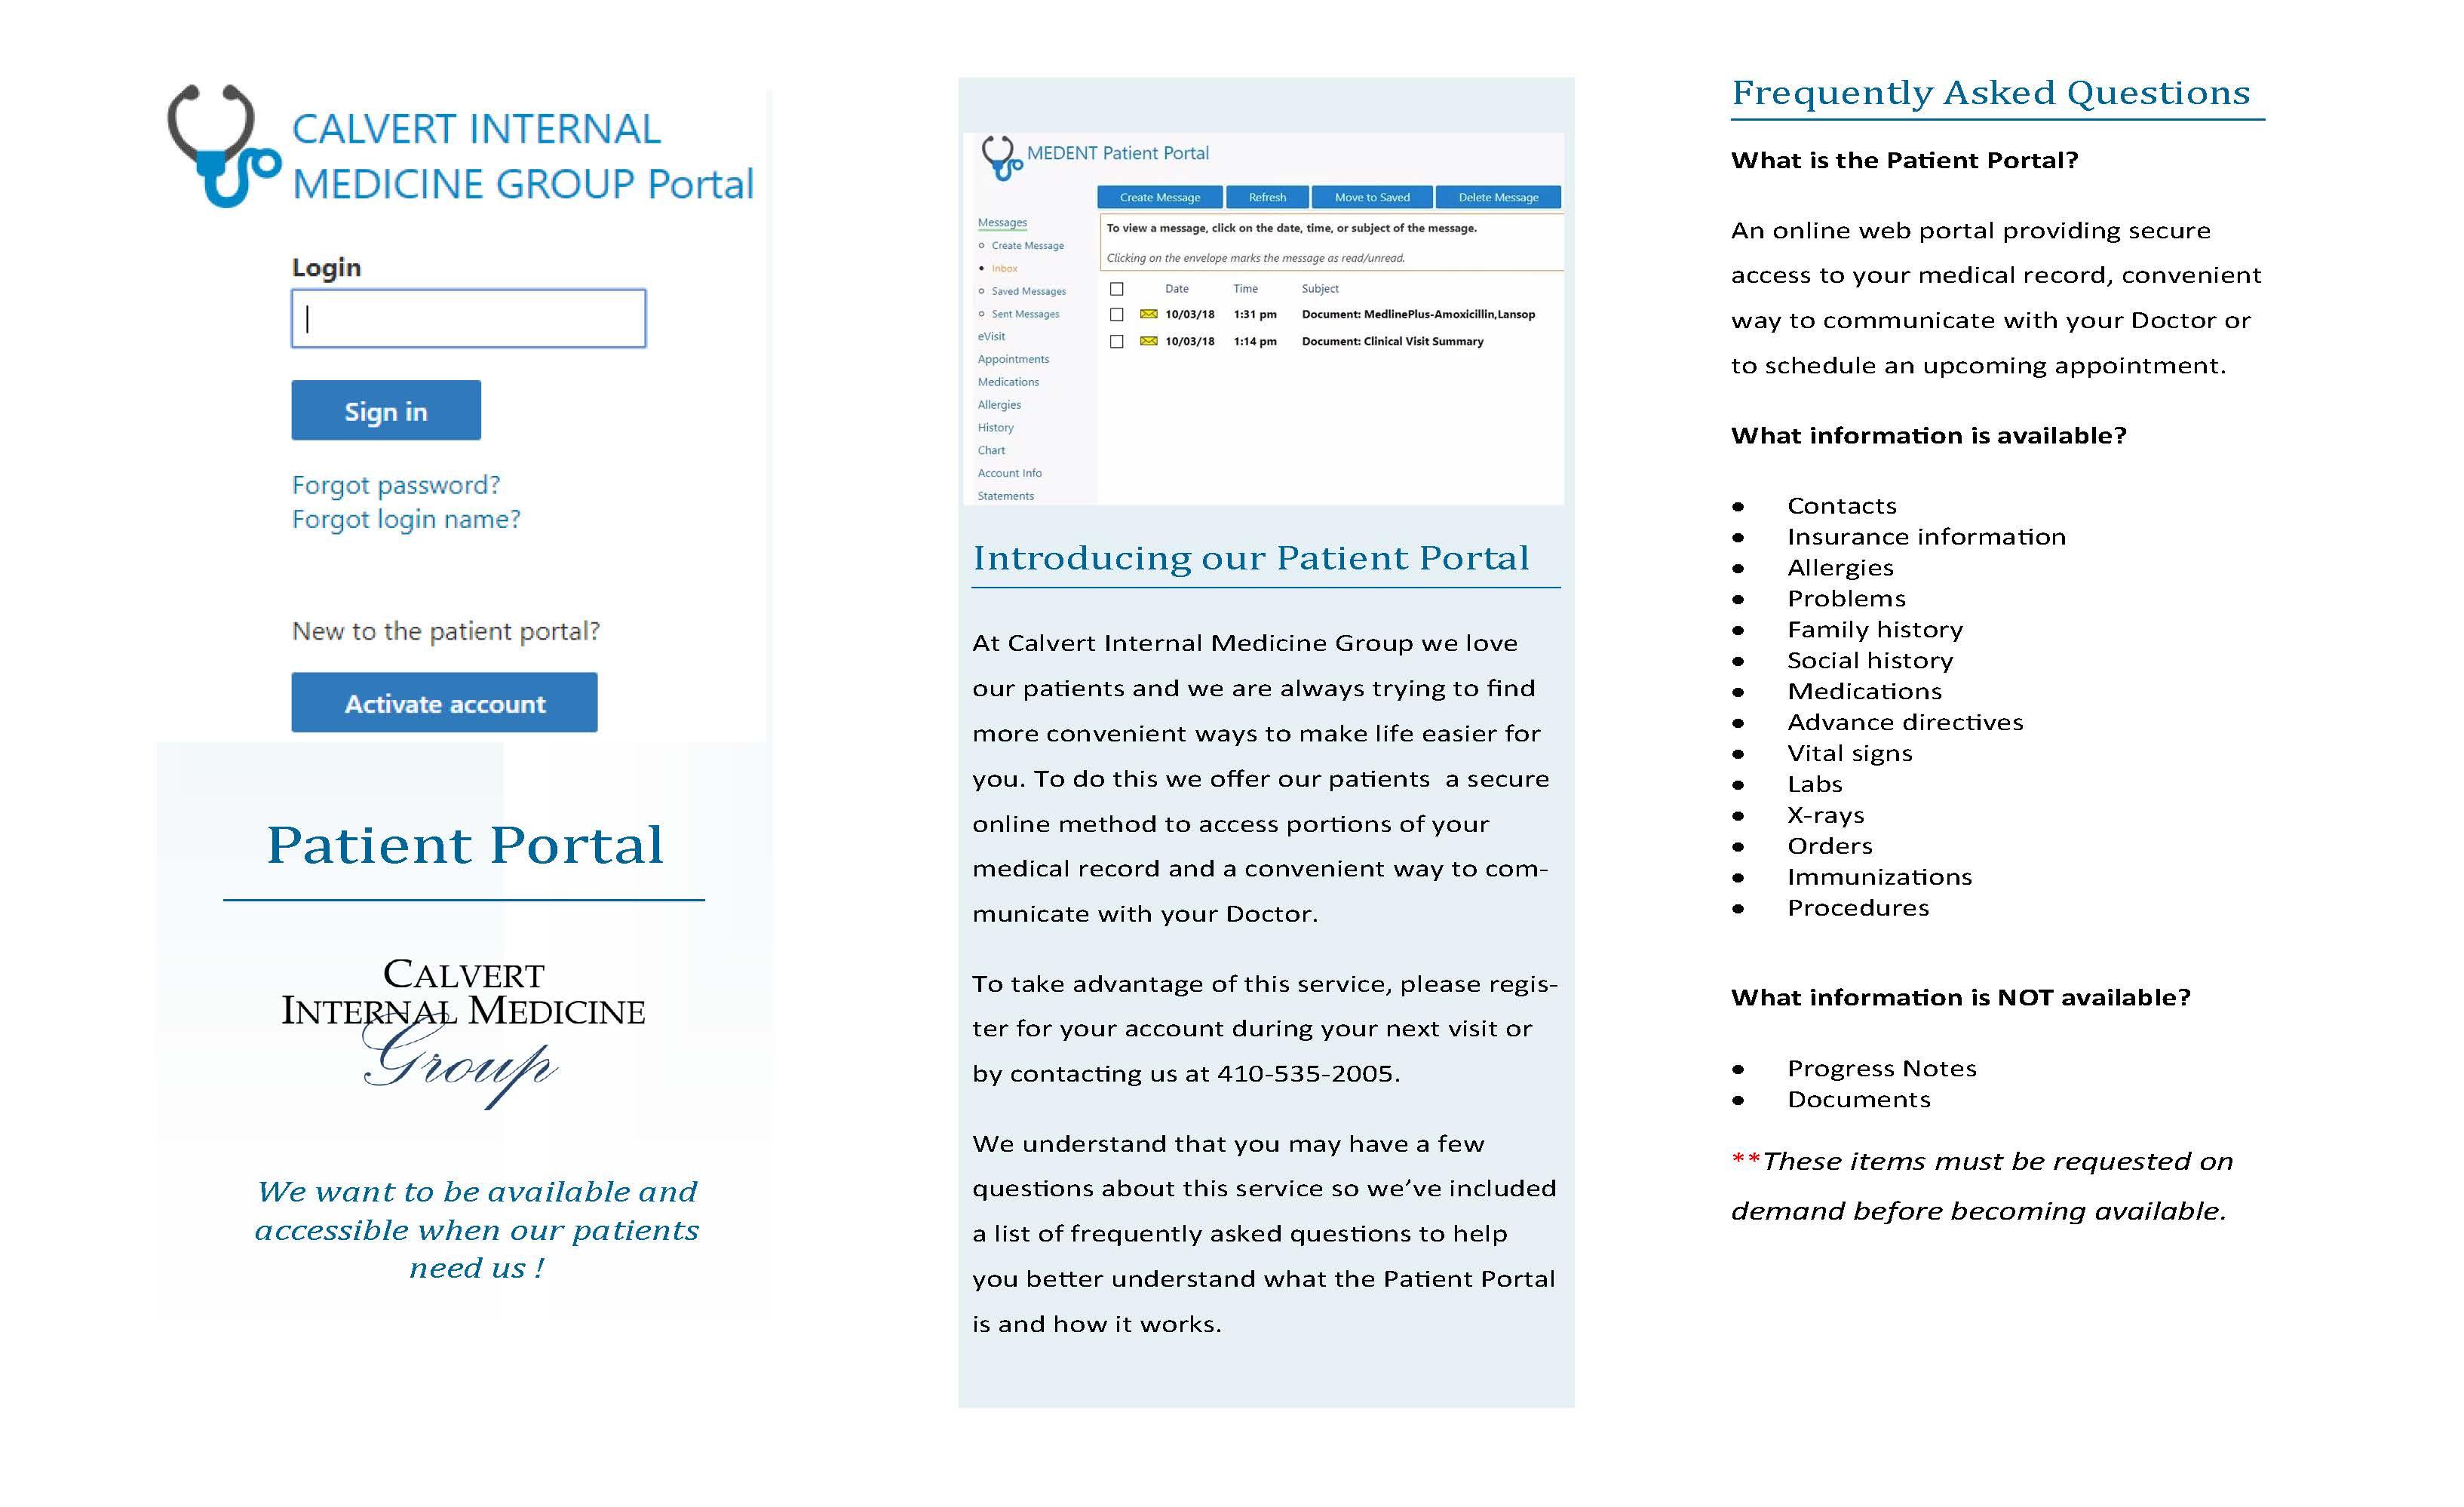 Medent Patient Portal - Calvert Internal Medicine Group